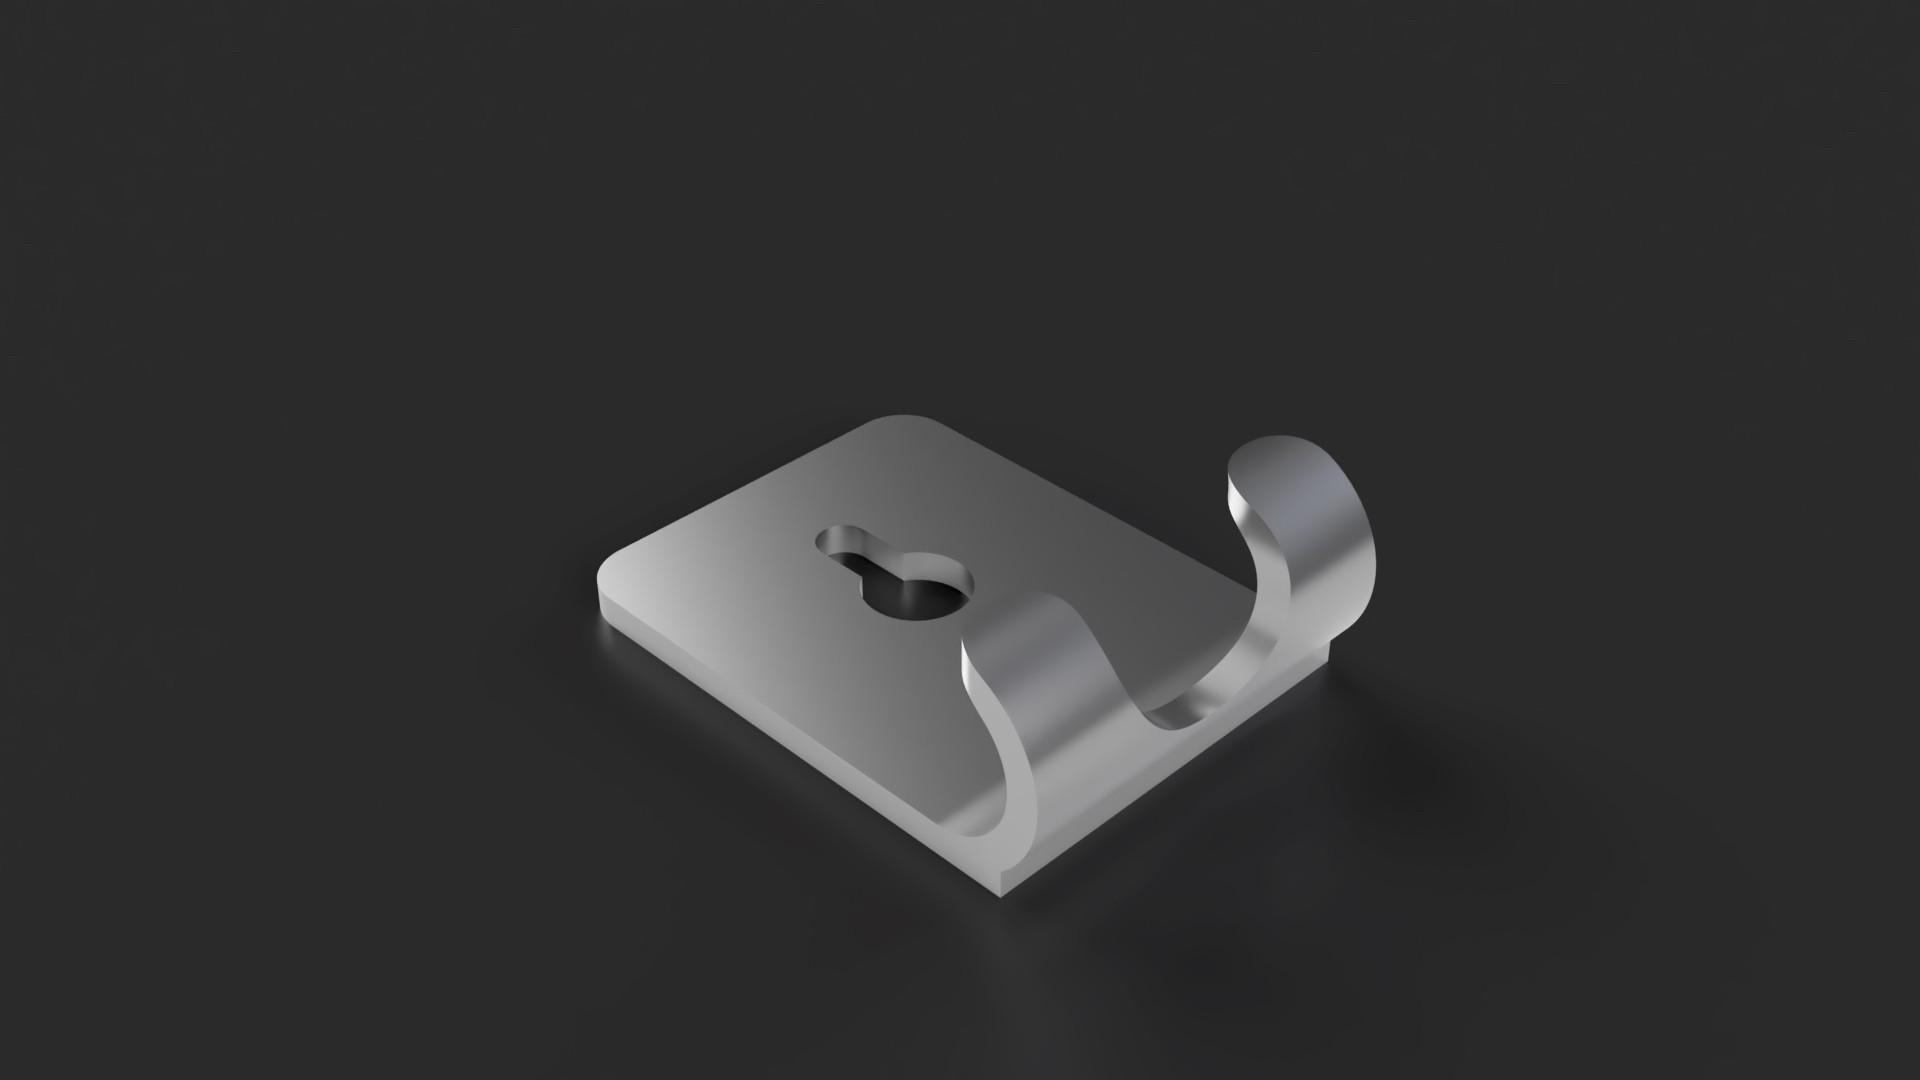 wall razor holder 1.jpg Télécharger fichier STL gratuit Support de rasoir • Design imprimable en 3D, Arostro